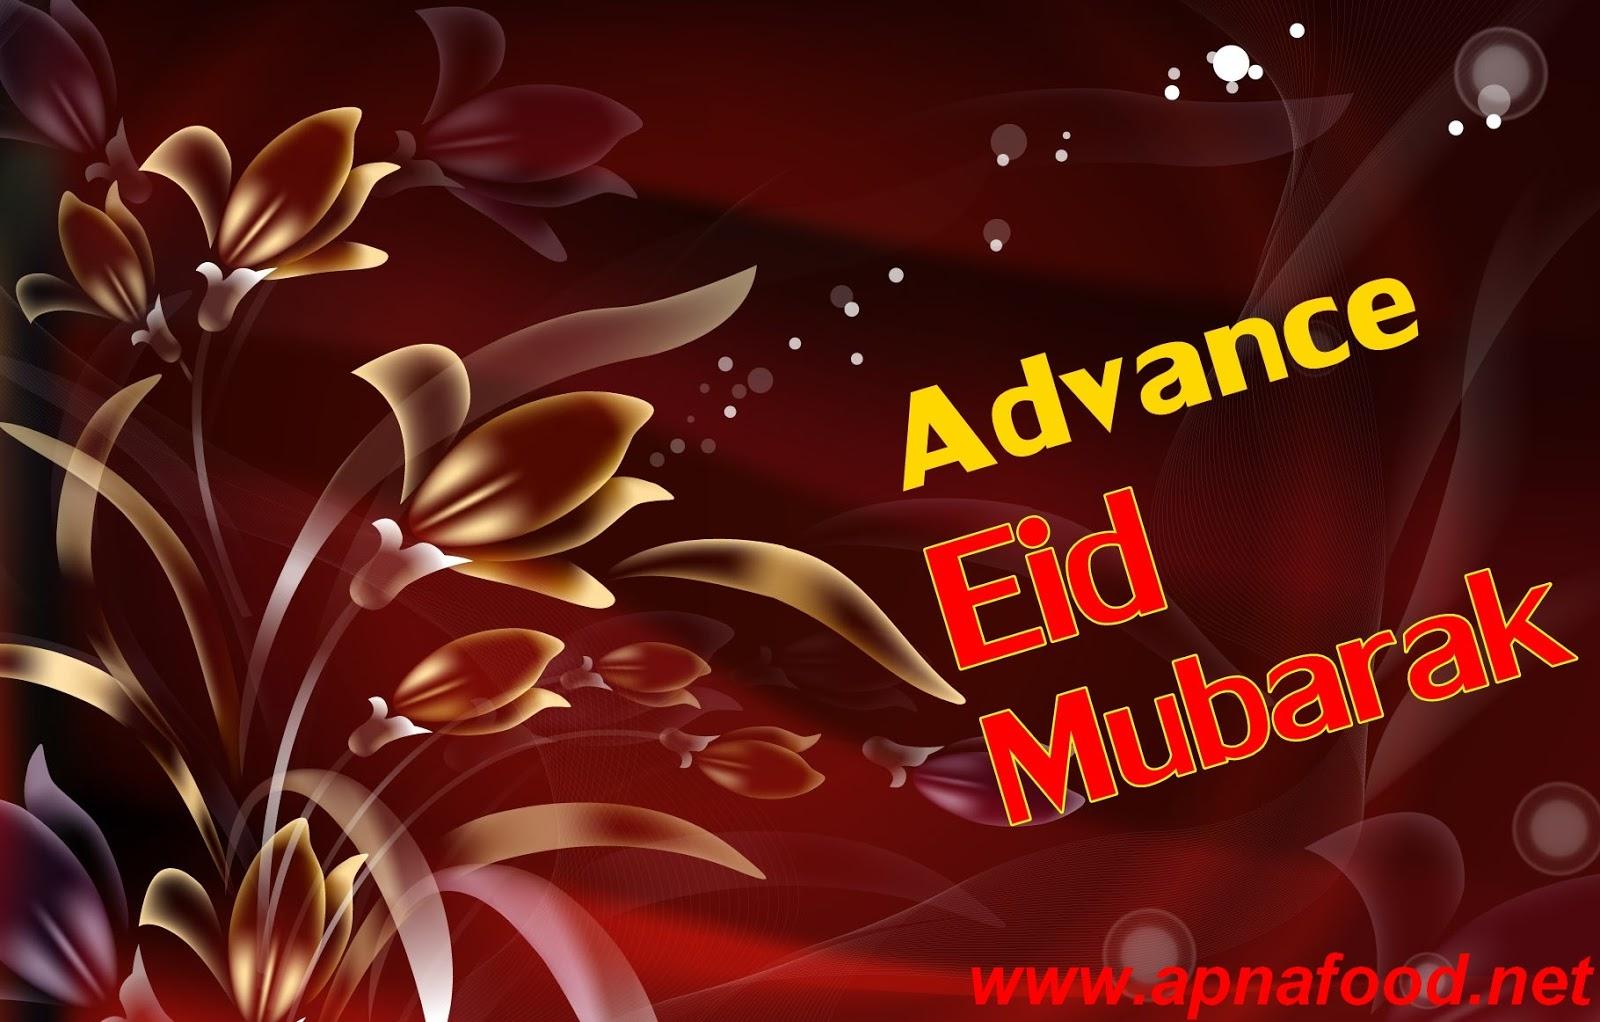 Advance Eid Mubarak Hd Wallpapers 2016 Apna Food